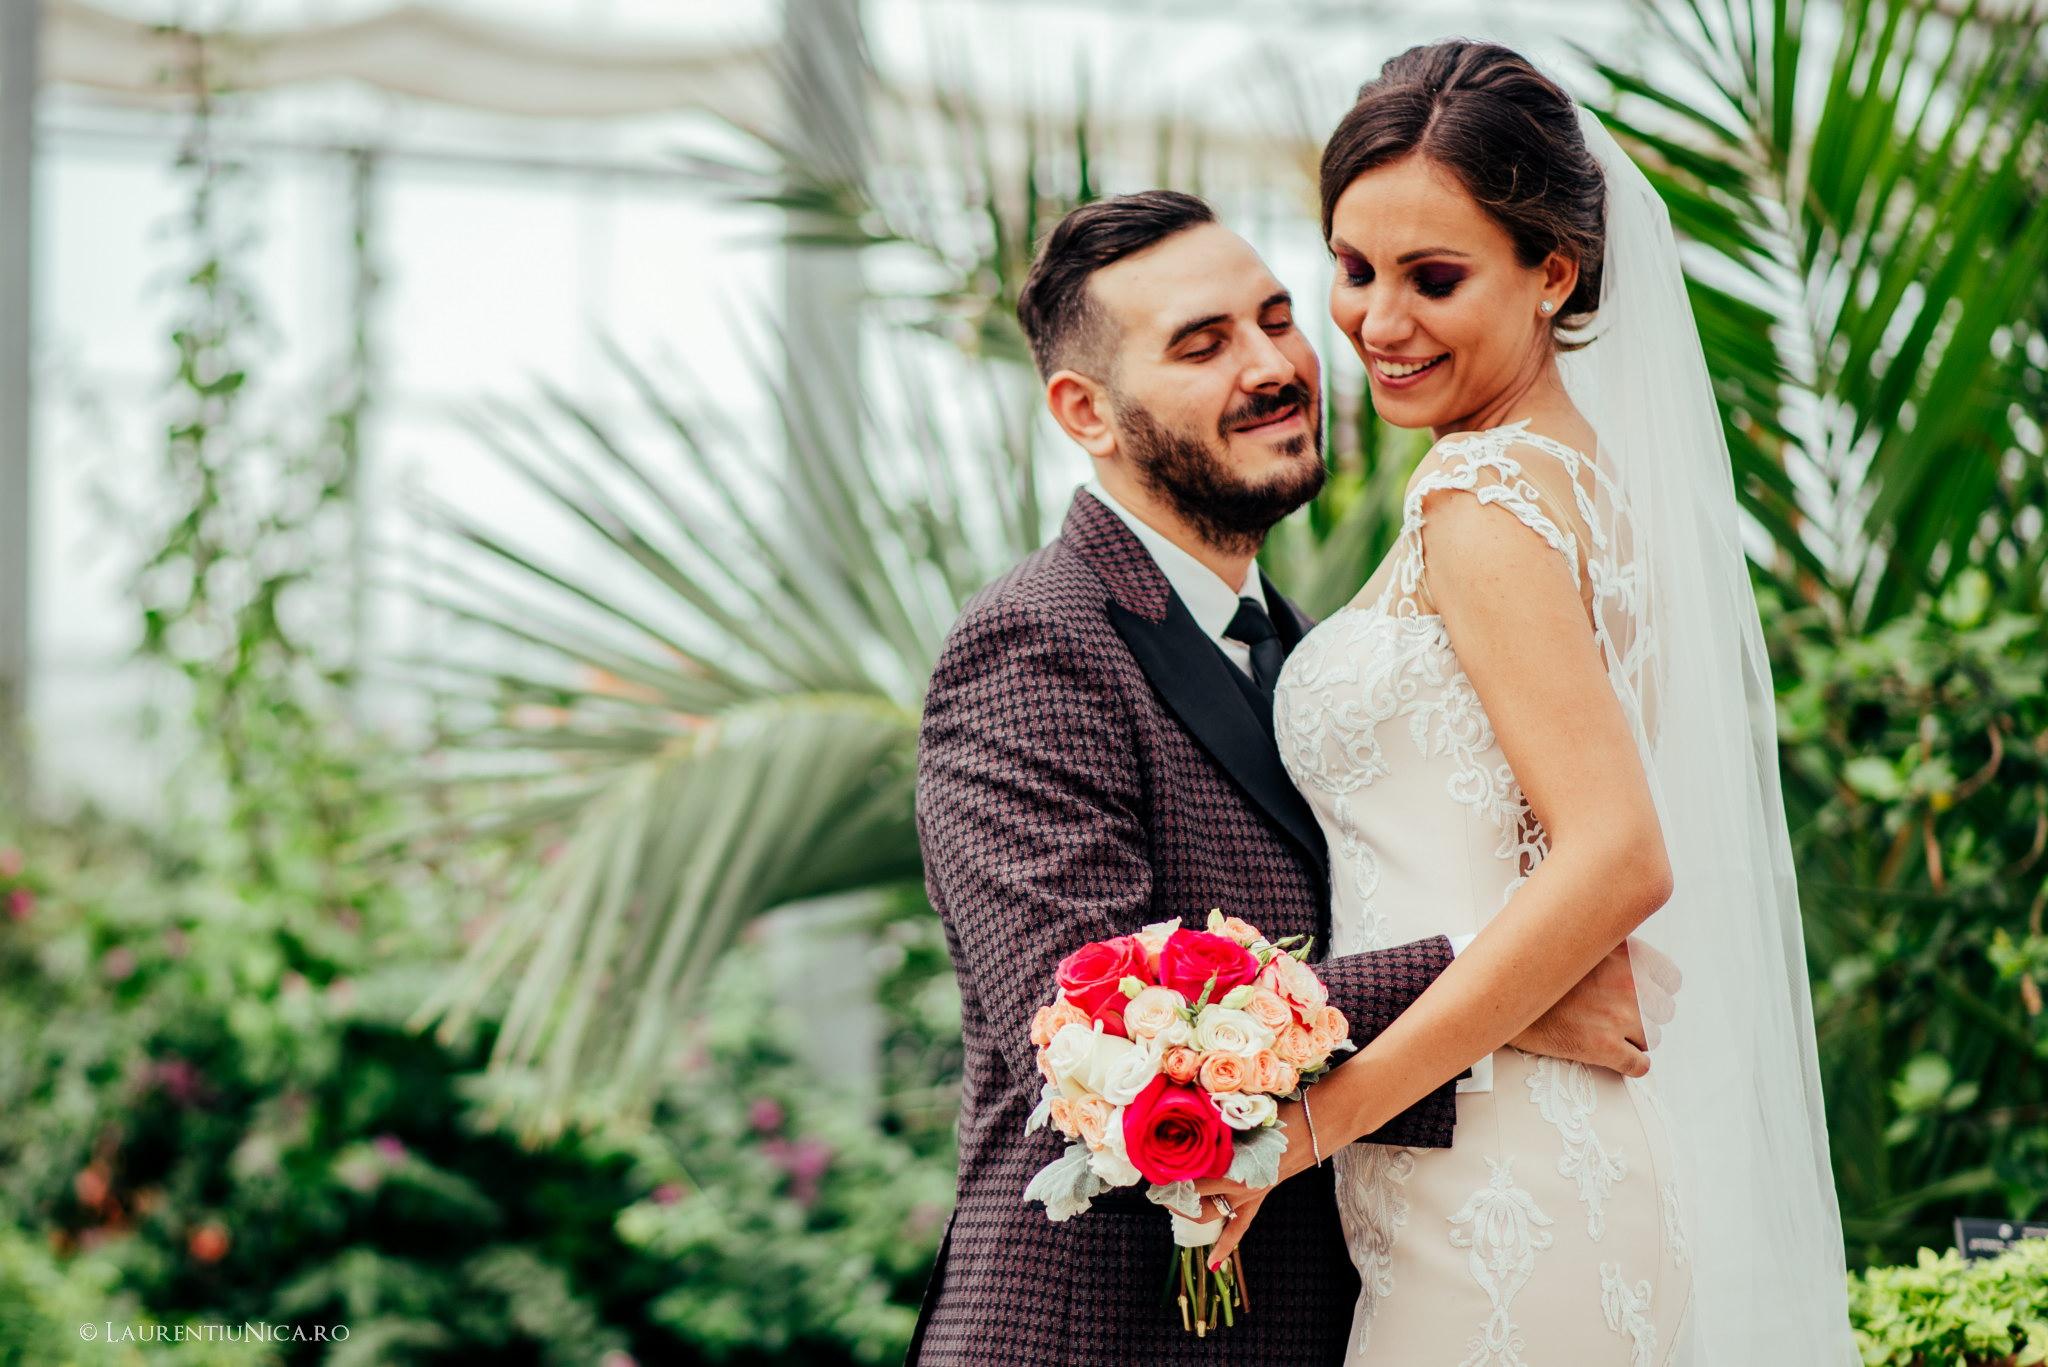 andreea si alin fotografii after wedding balchik bulgaria13 - Andreea & Alin | Fotografii After Wedding | Balchik Bulgaria